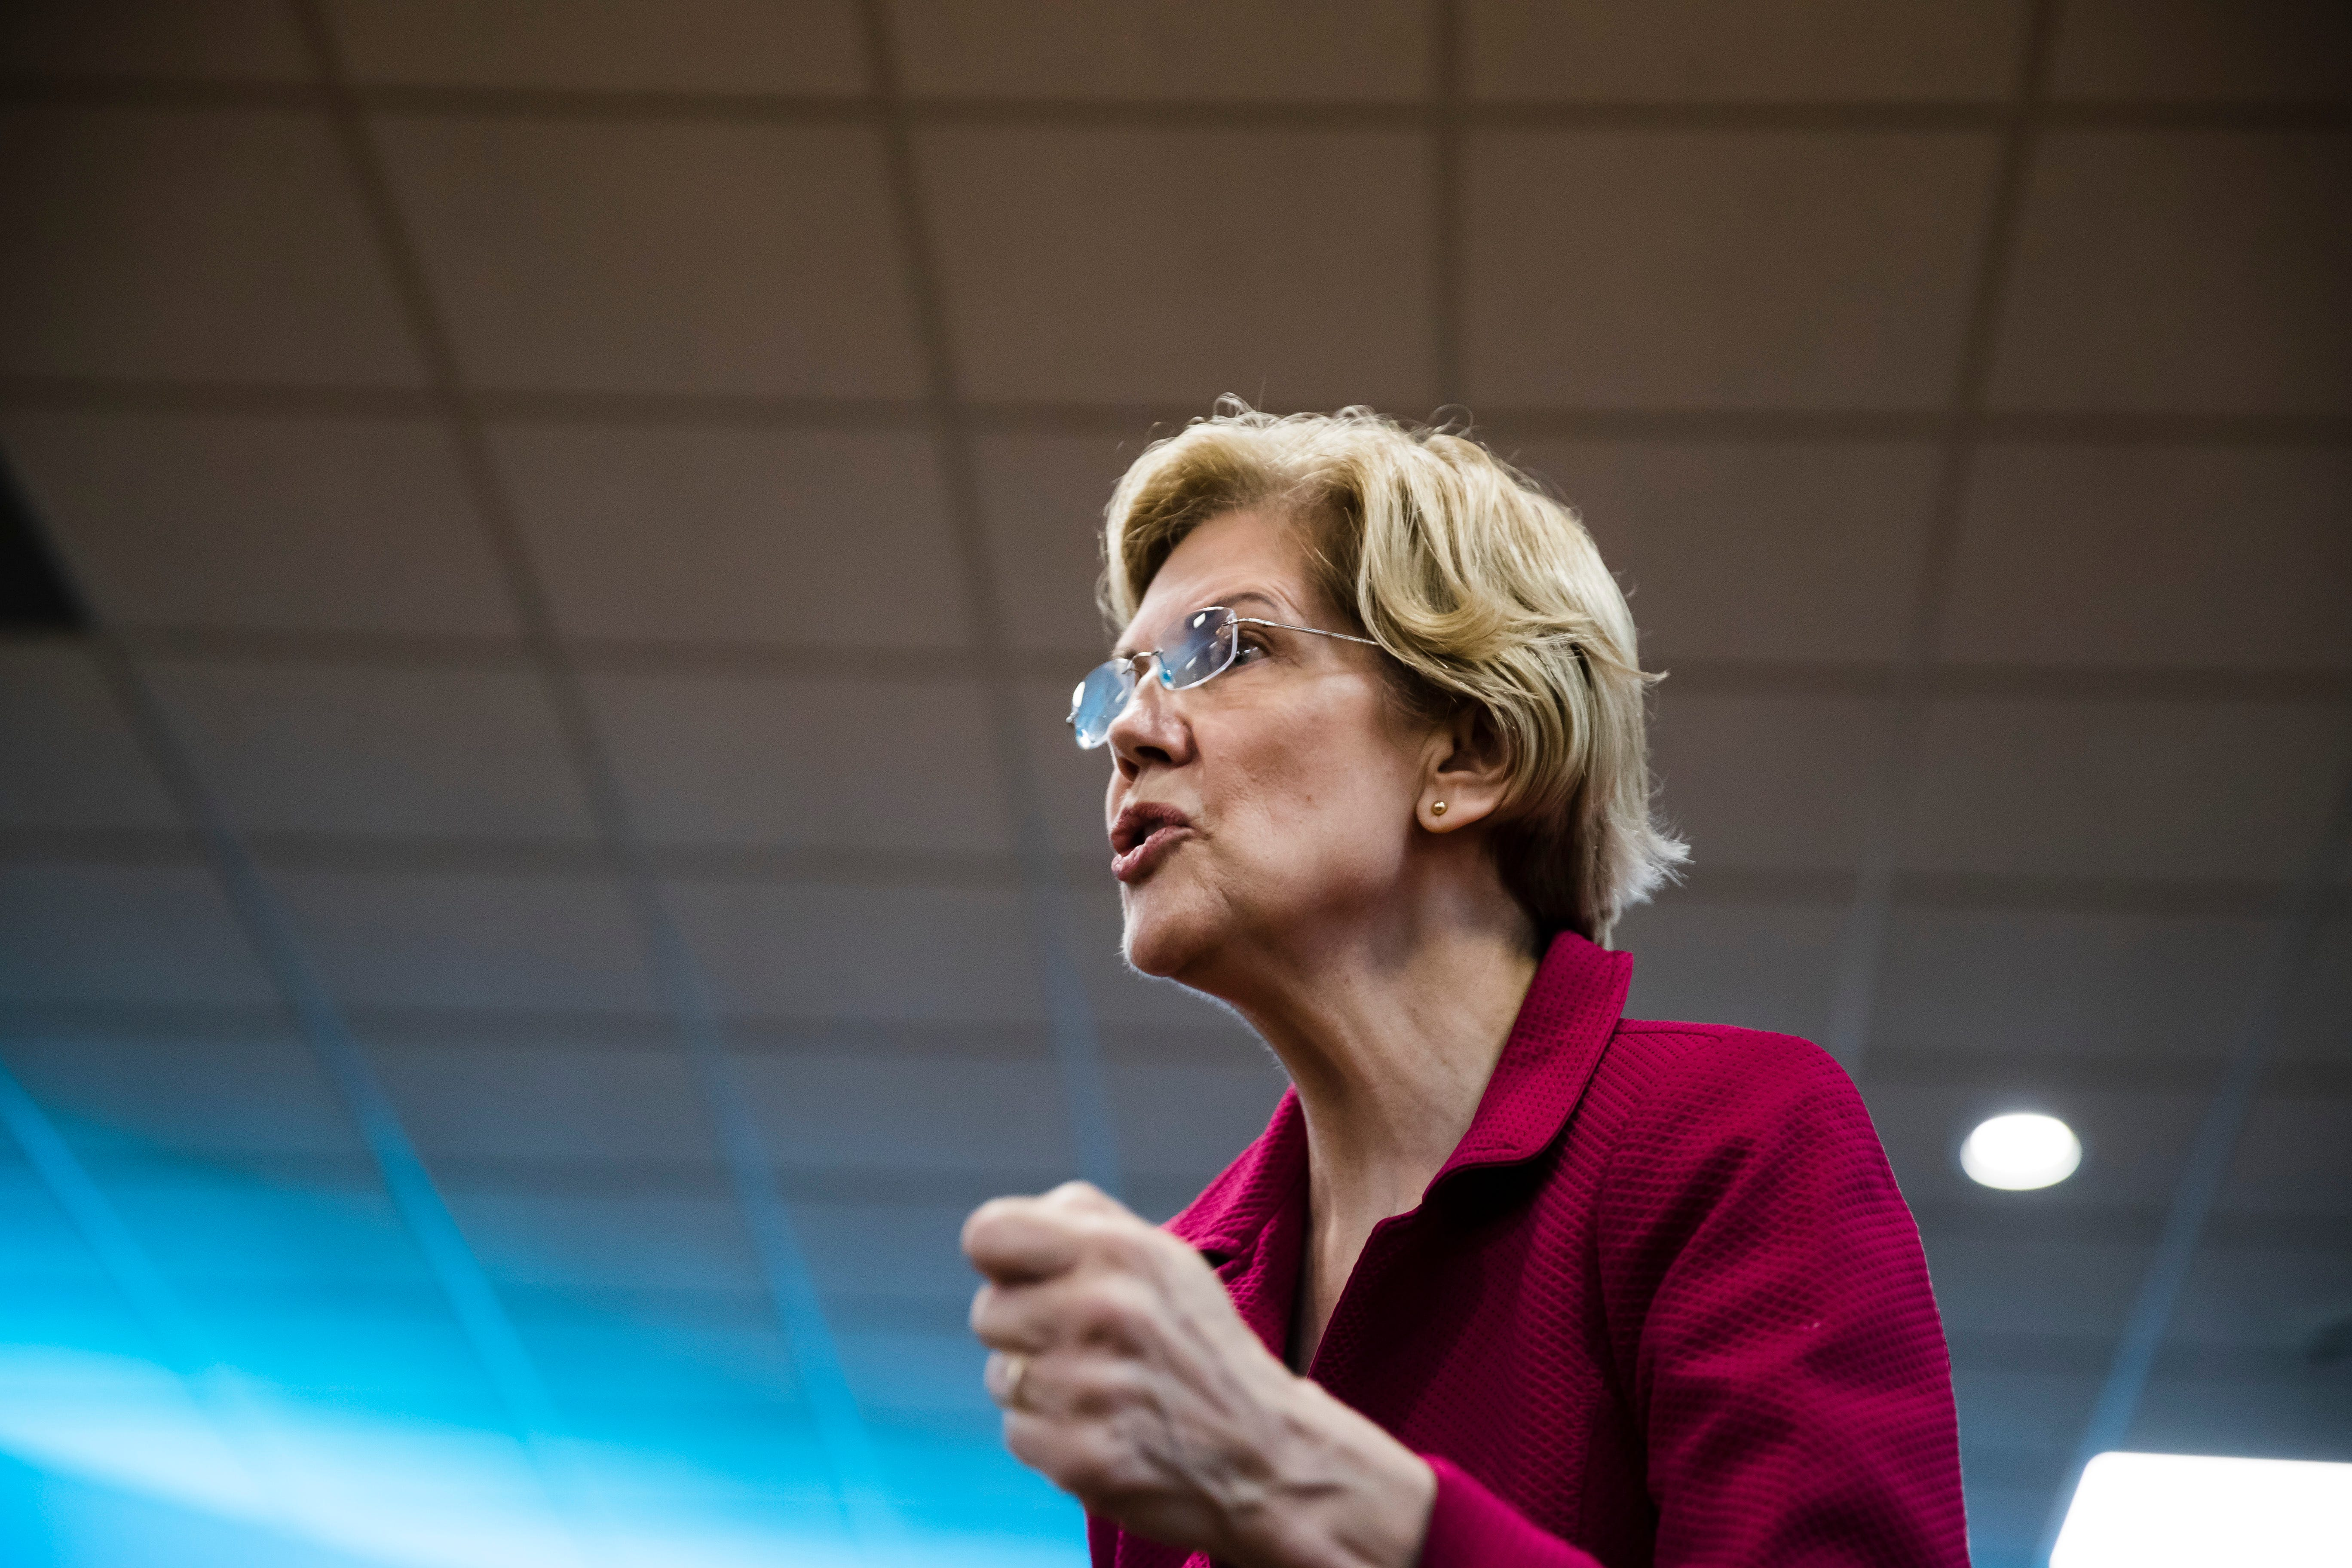 Drain the swamp? Warren says it's time to stem Pentagon-to-lobbying revolving door